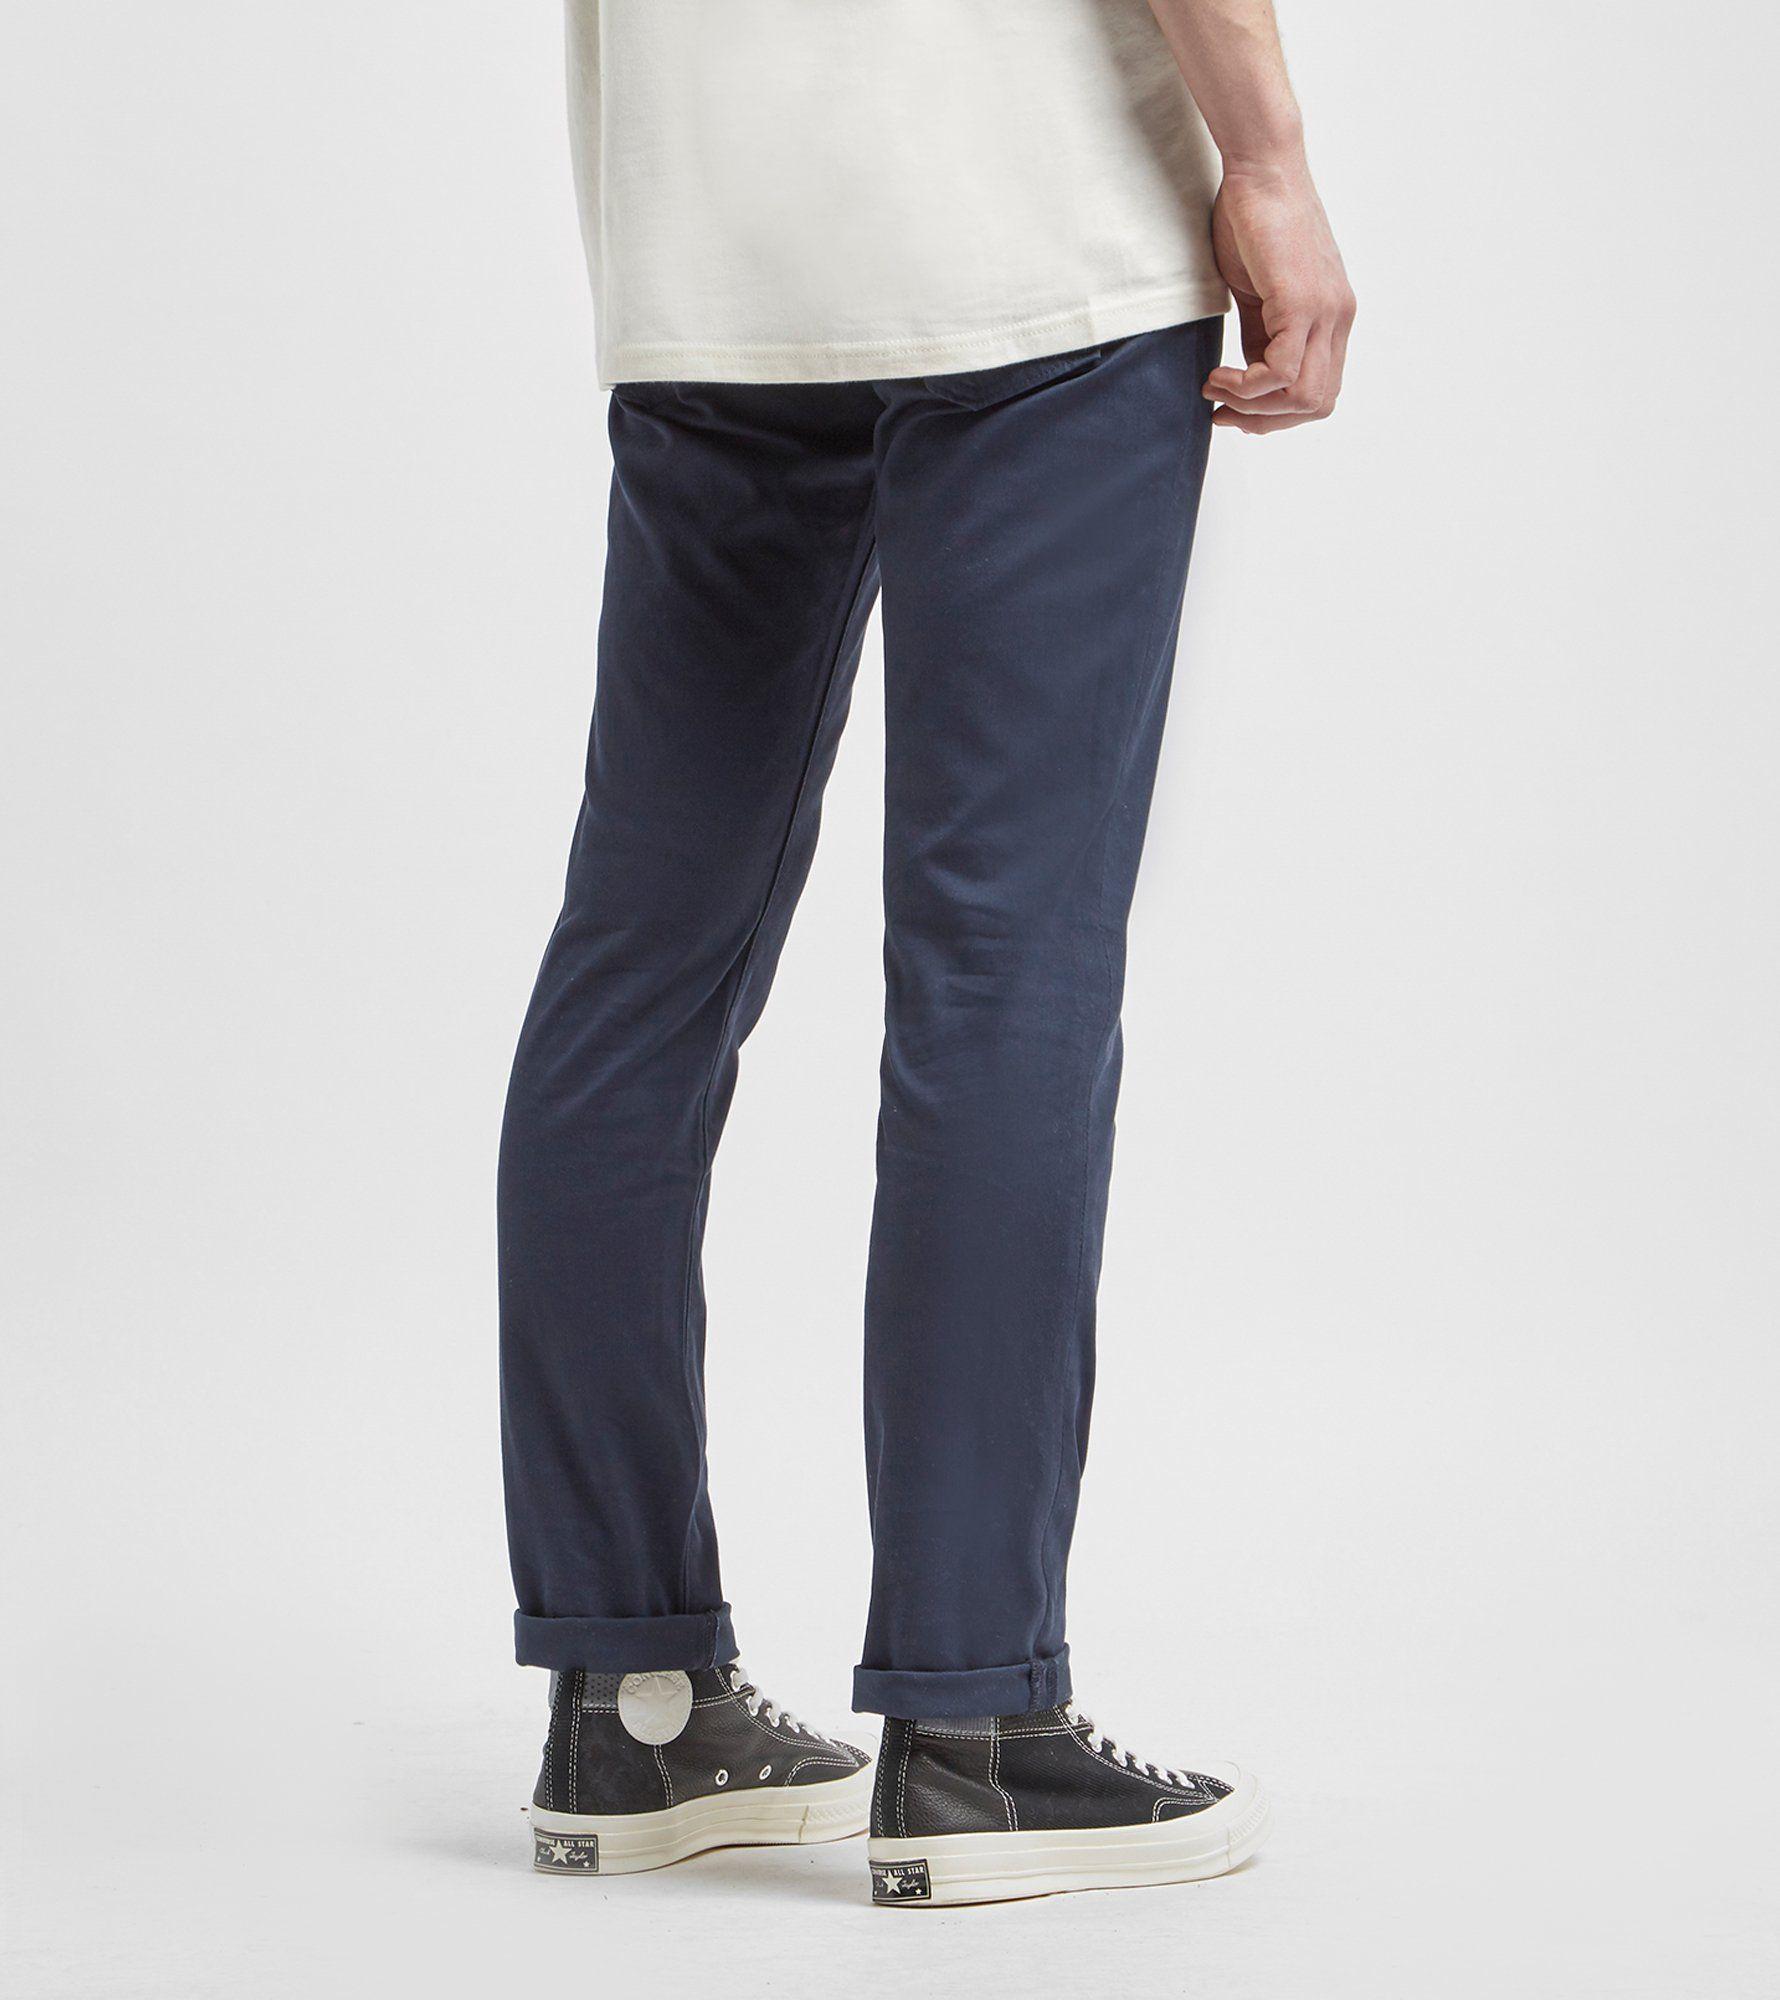 LEVI'S 511 Slim Fit Cord Jeans